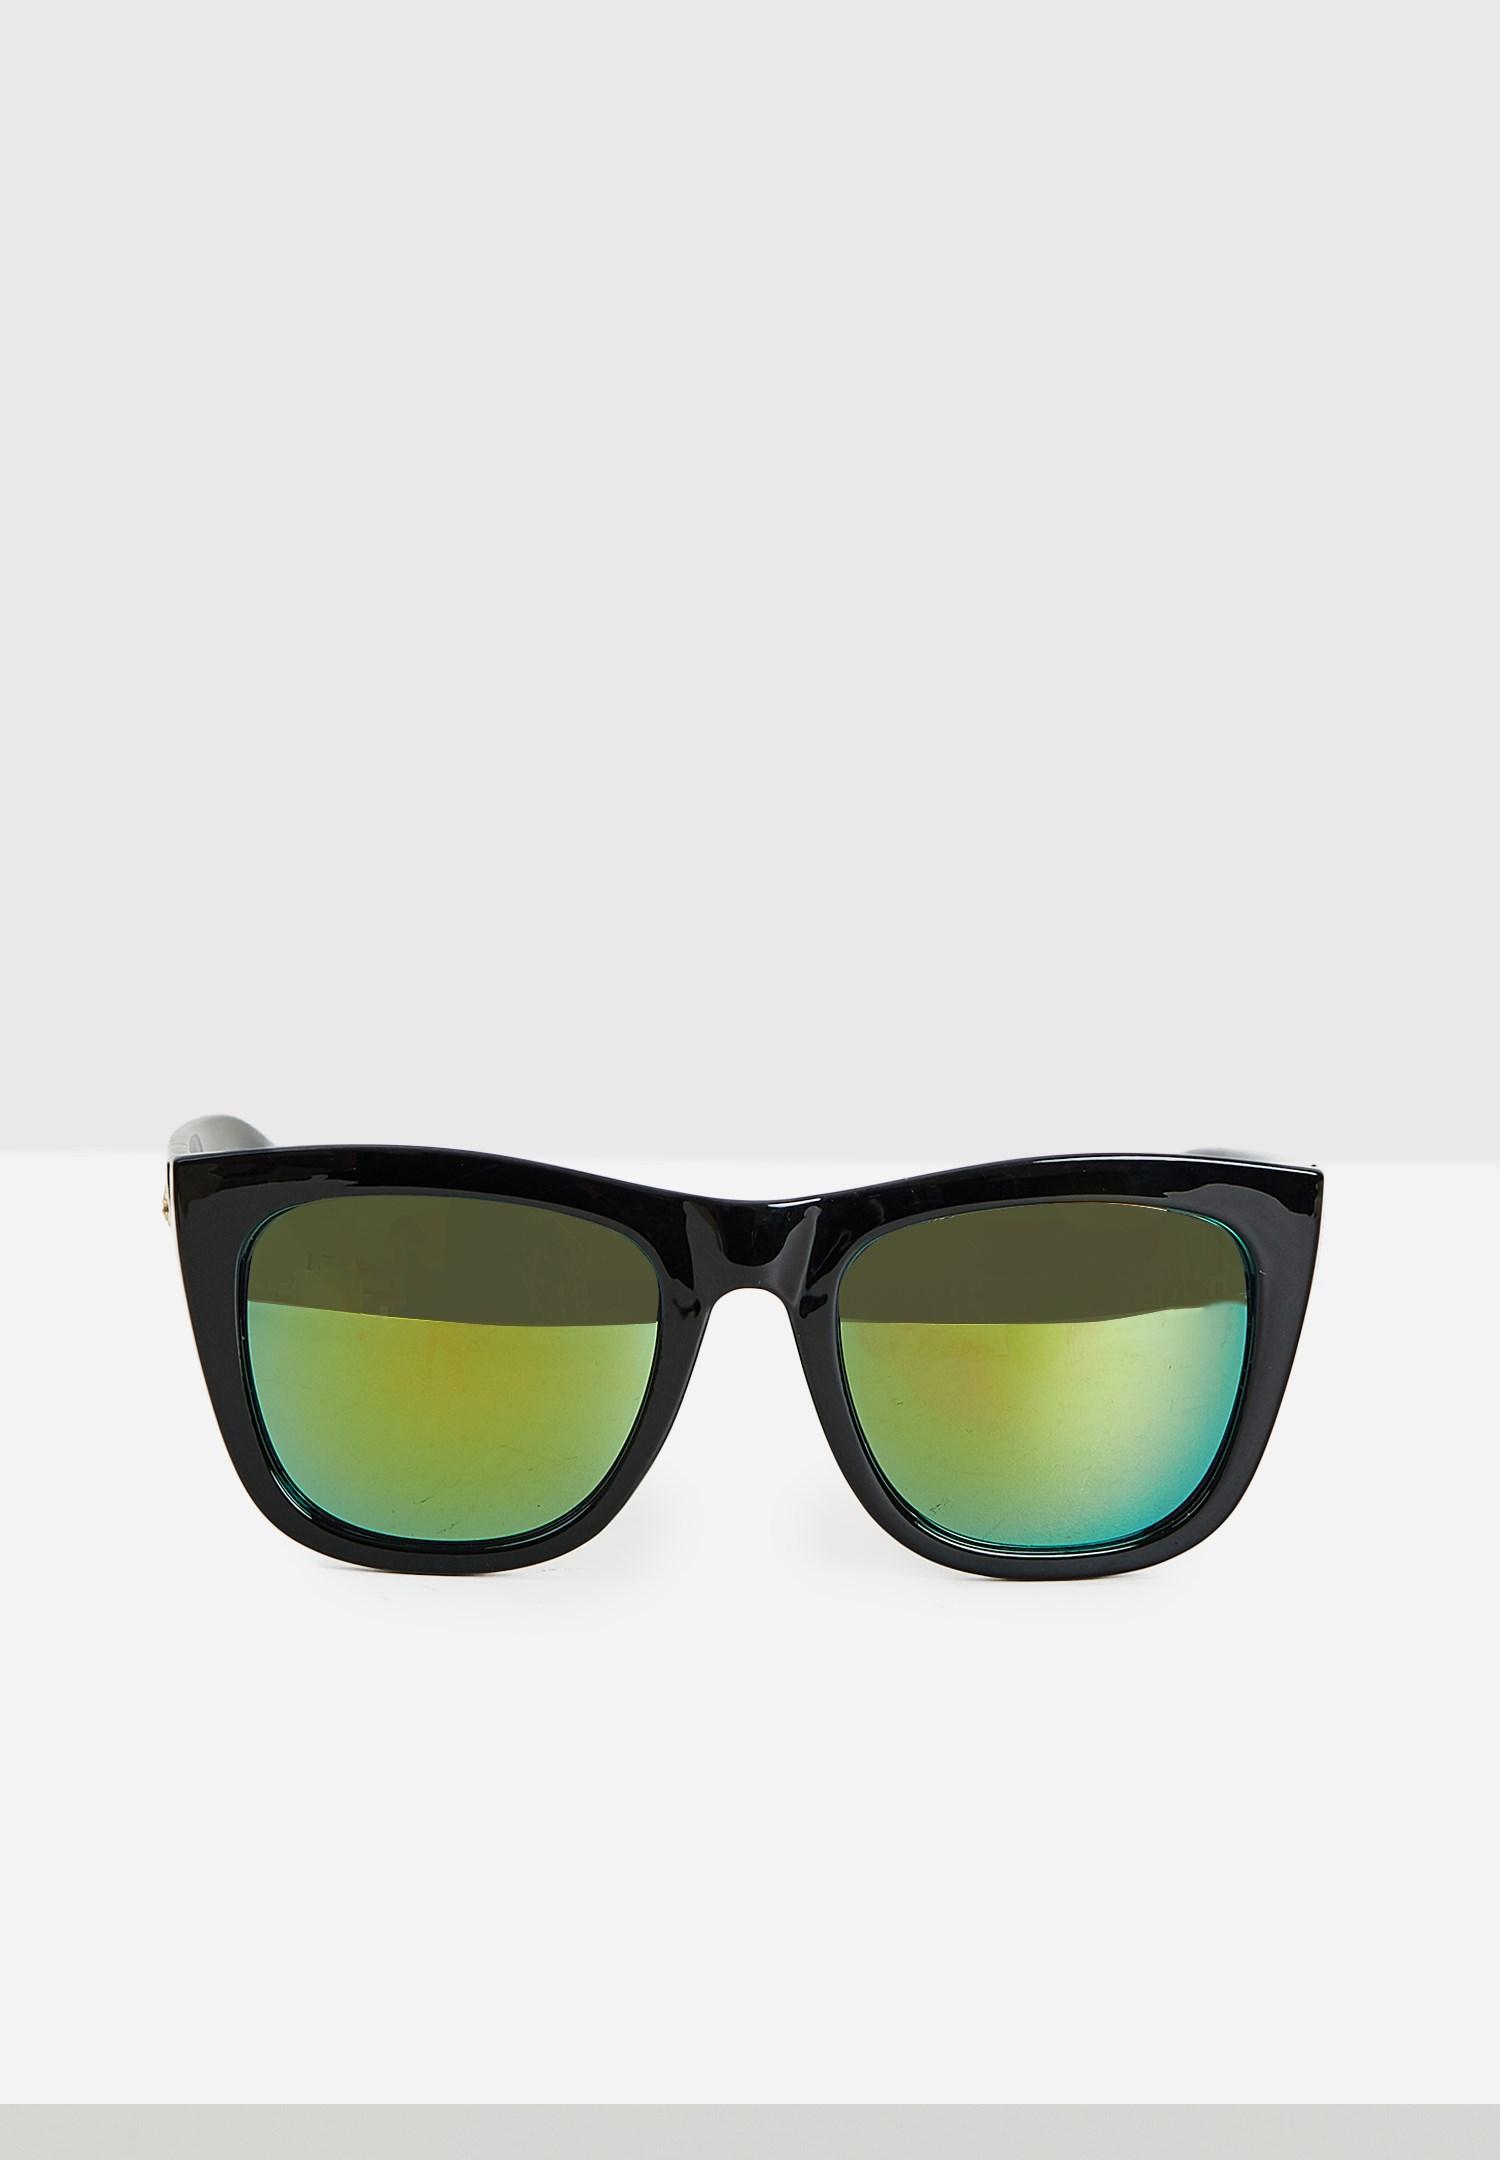 Bayan Siyah Renkli Camlı Gözlük